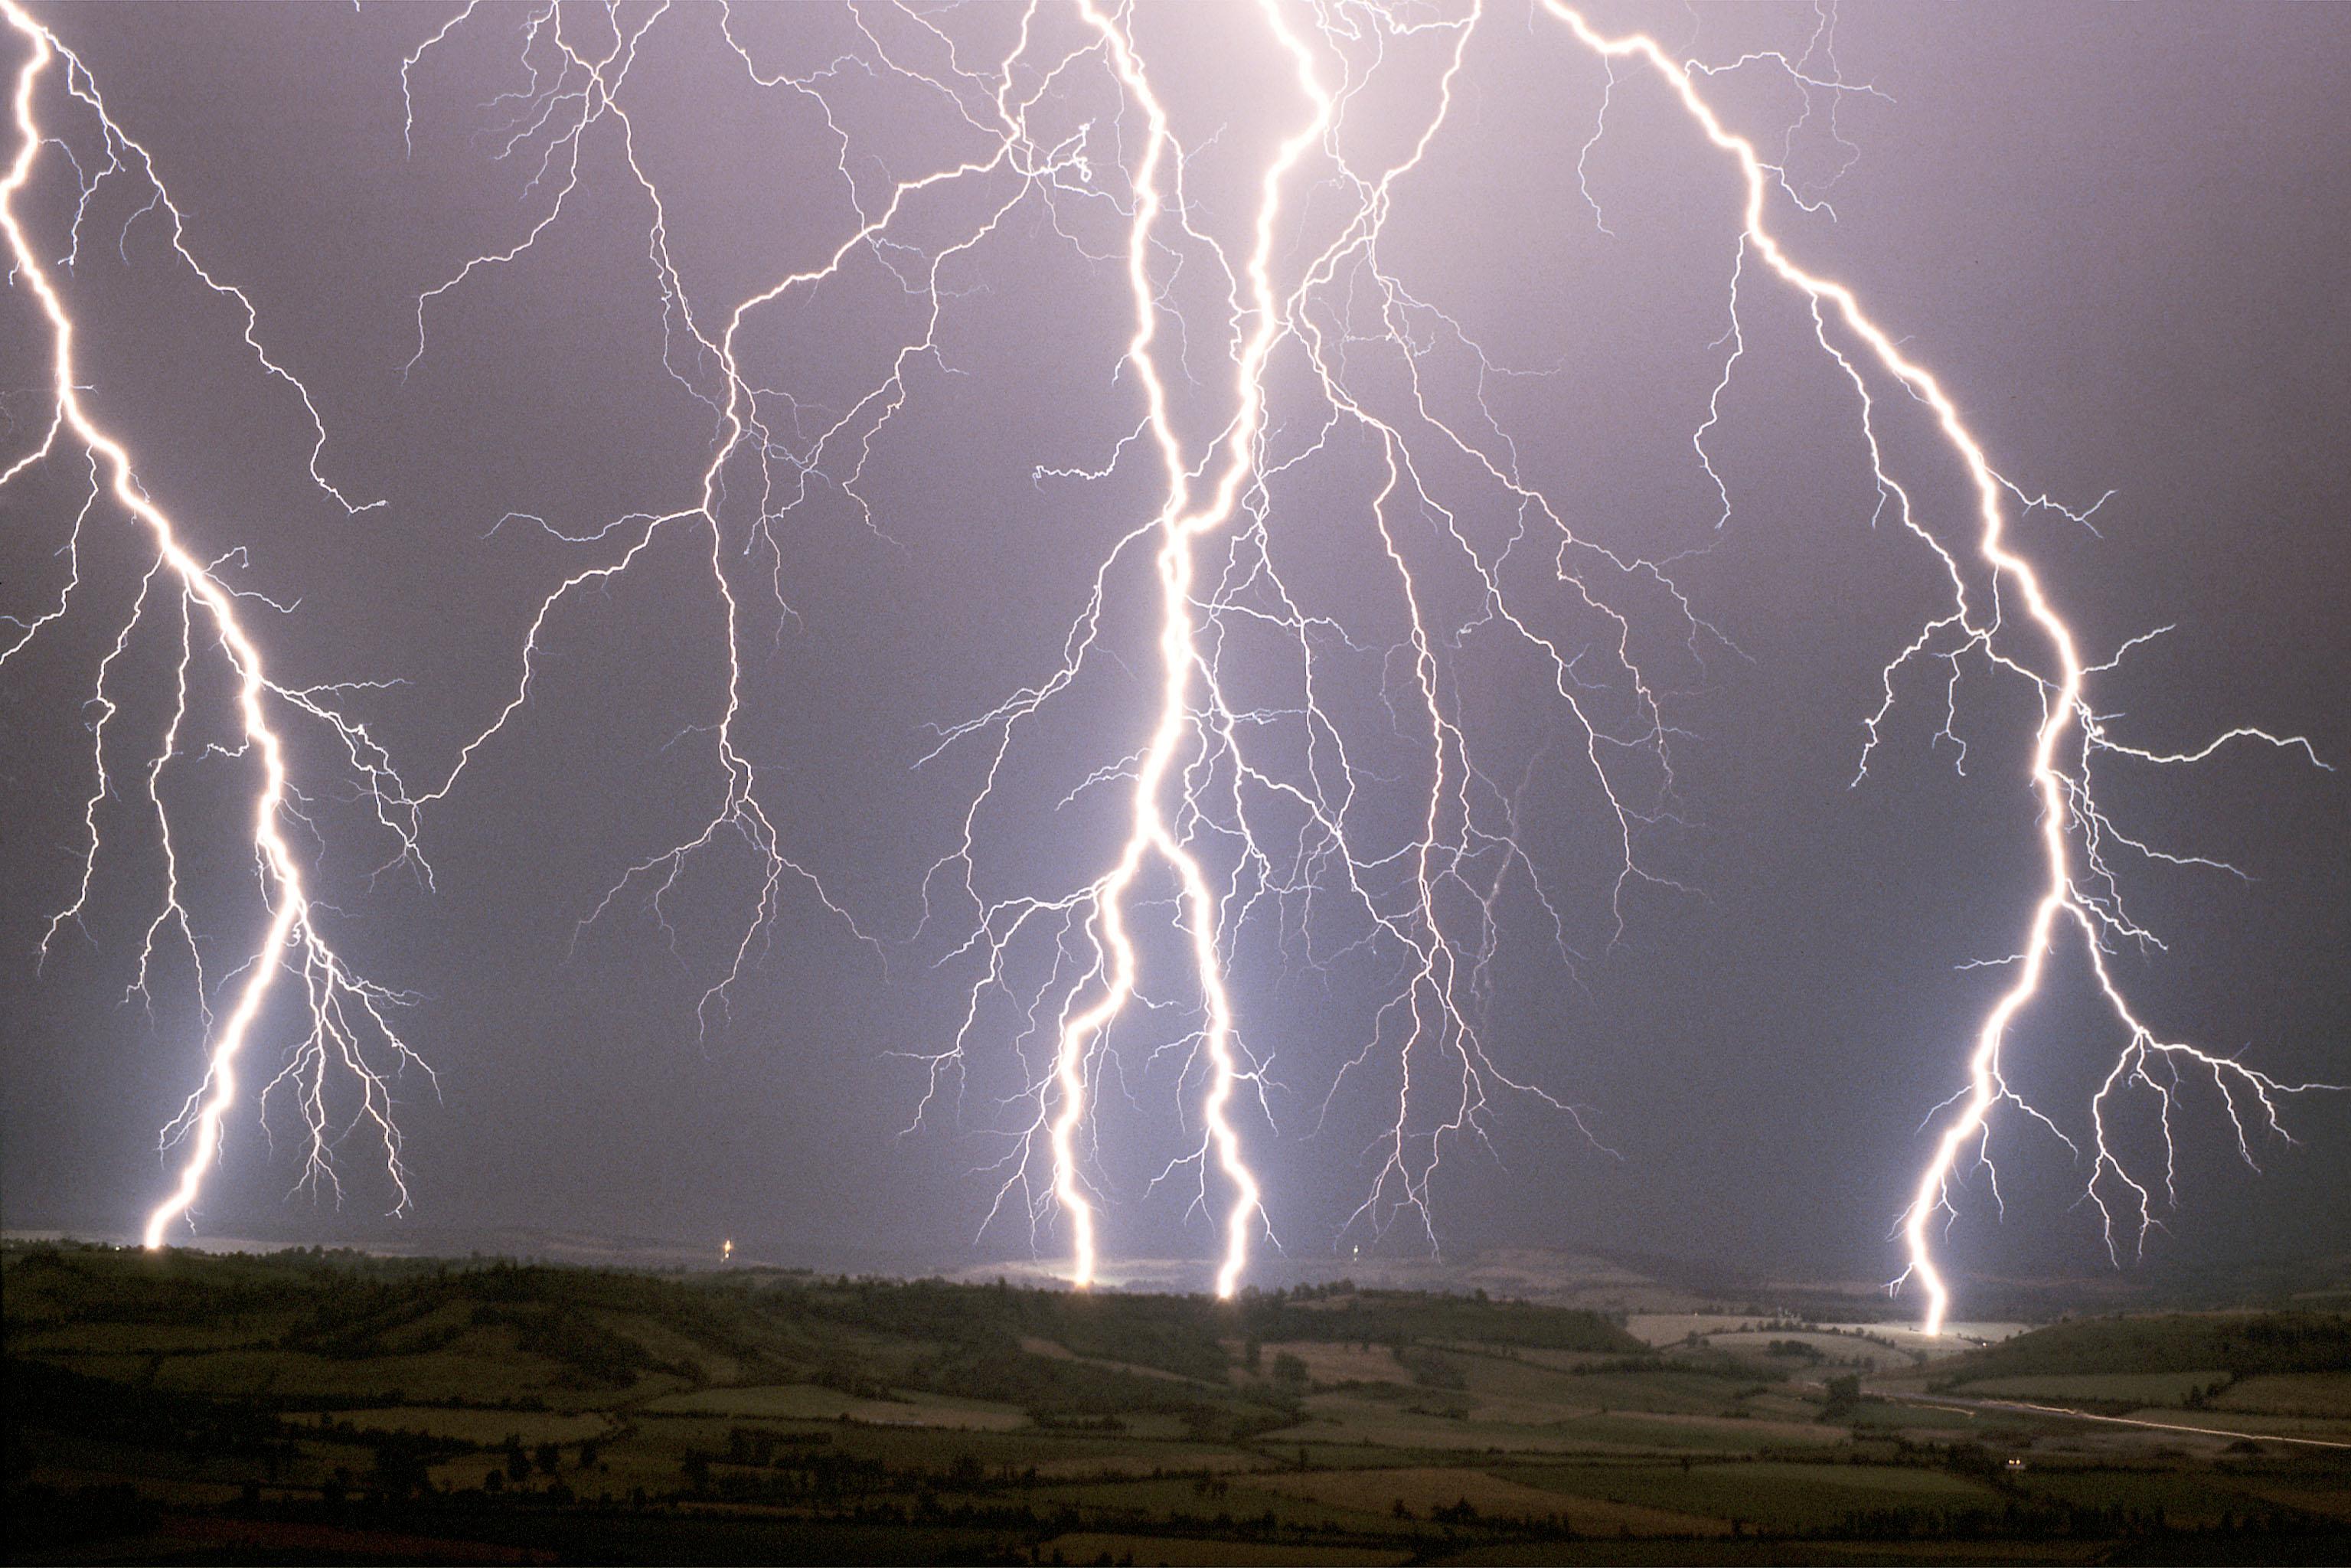 Alex Hermant Storm Chaser For Years FOUDRE - Storm chaser gets struck lightning films